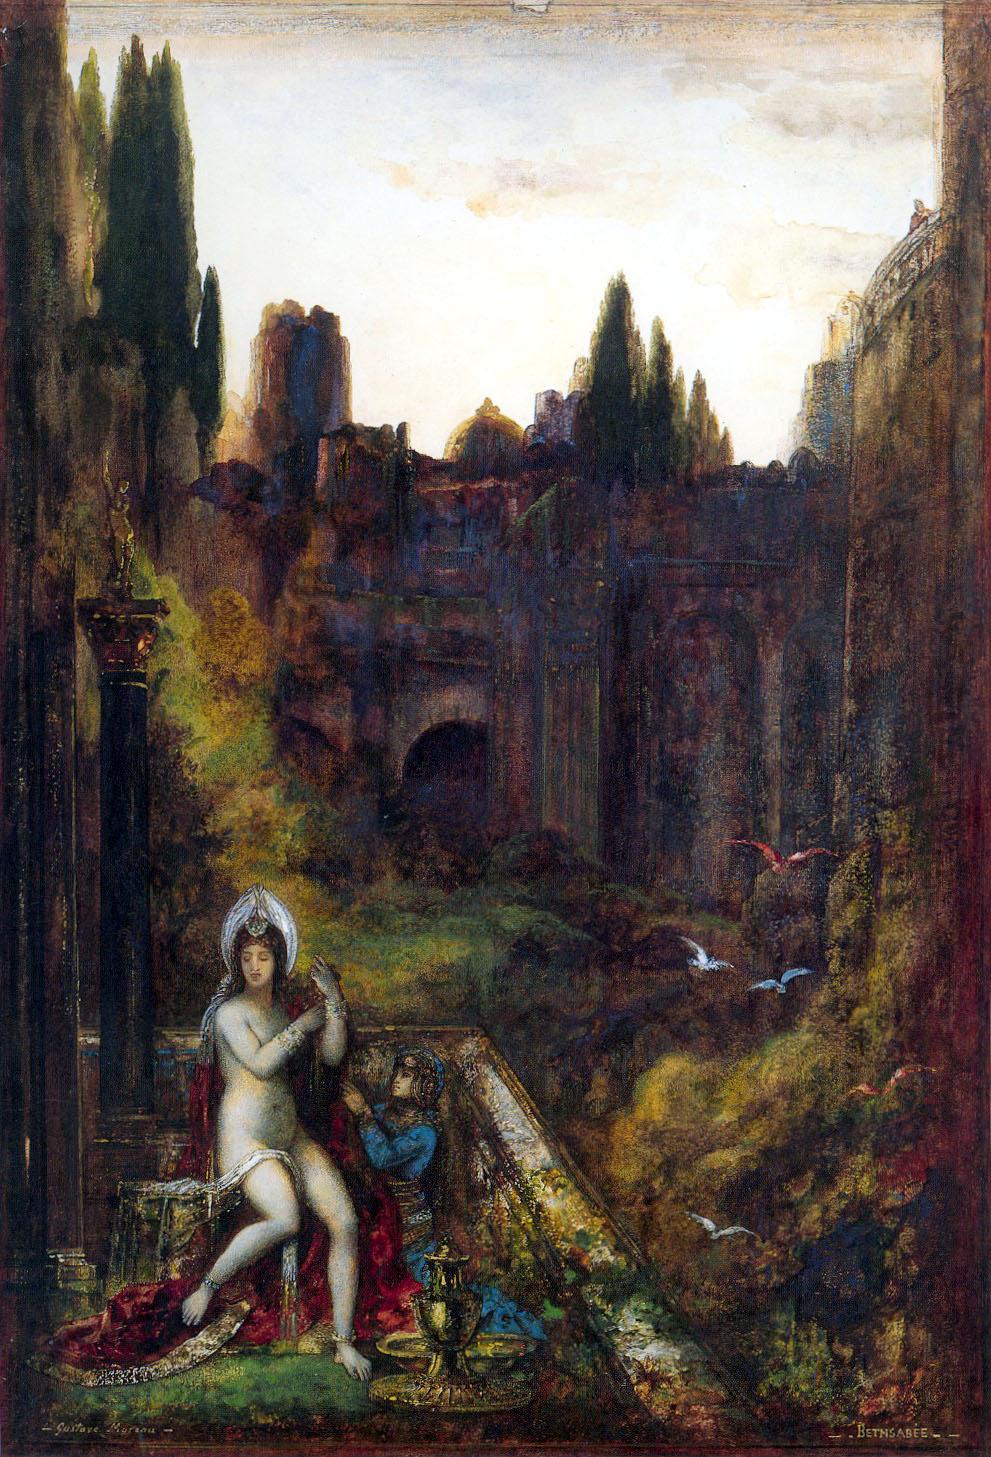 1885-1886_Вирсавия (41.5 х 59.2 см) (акварель и гуашь) (Париж, Лувр)